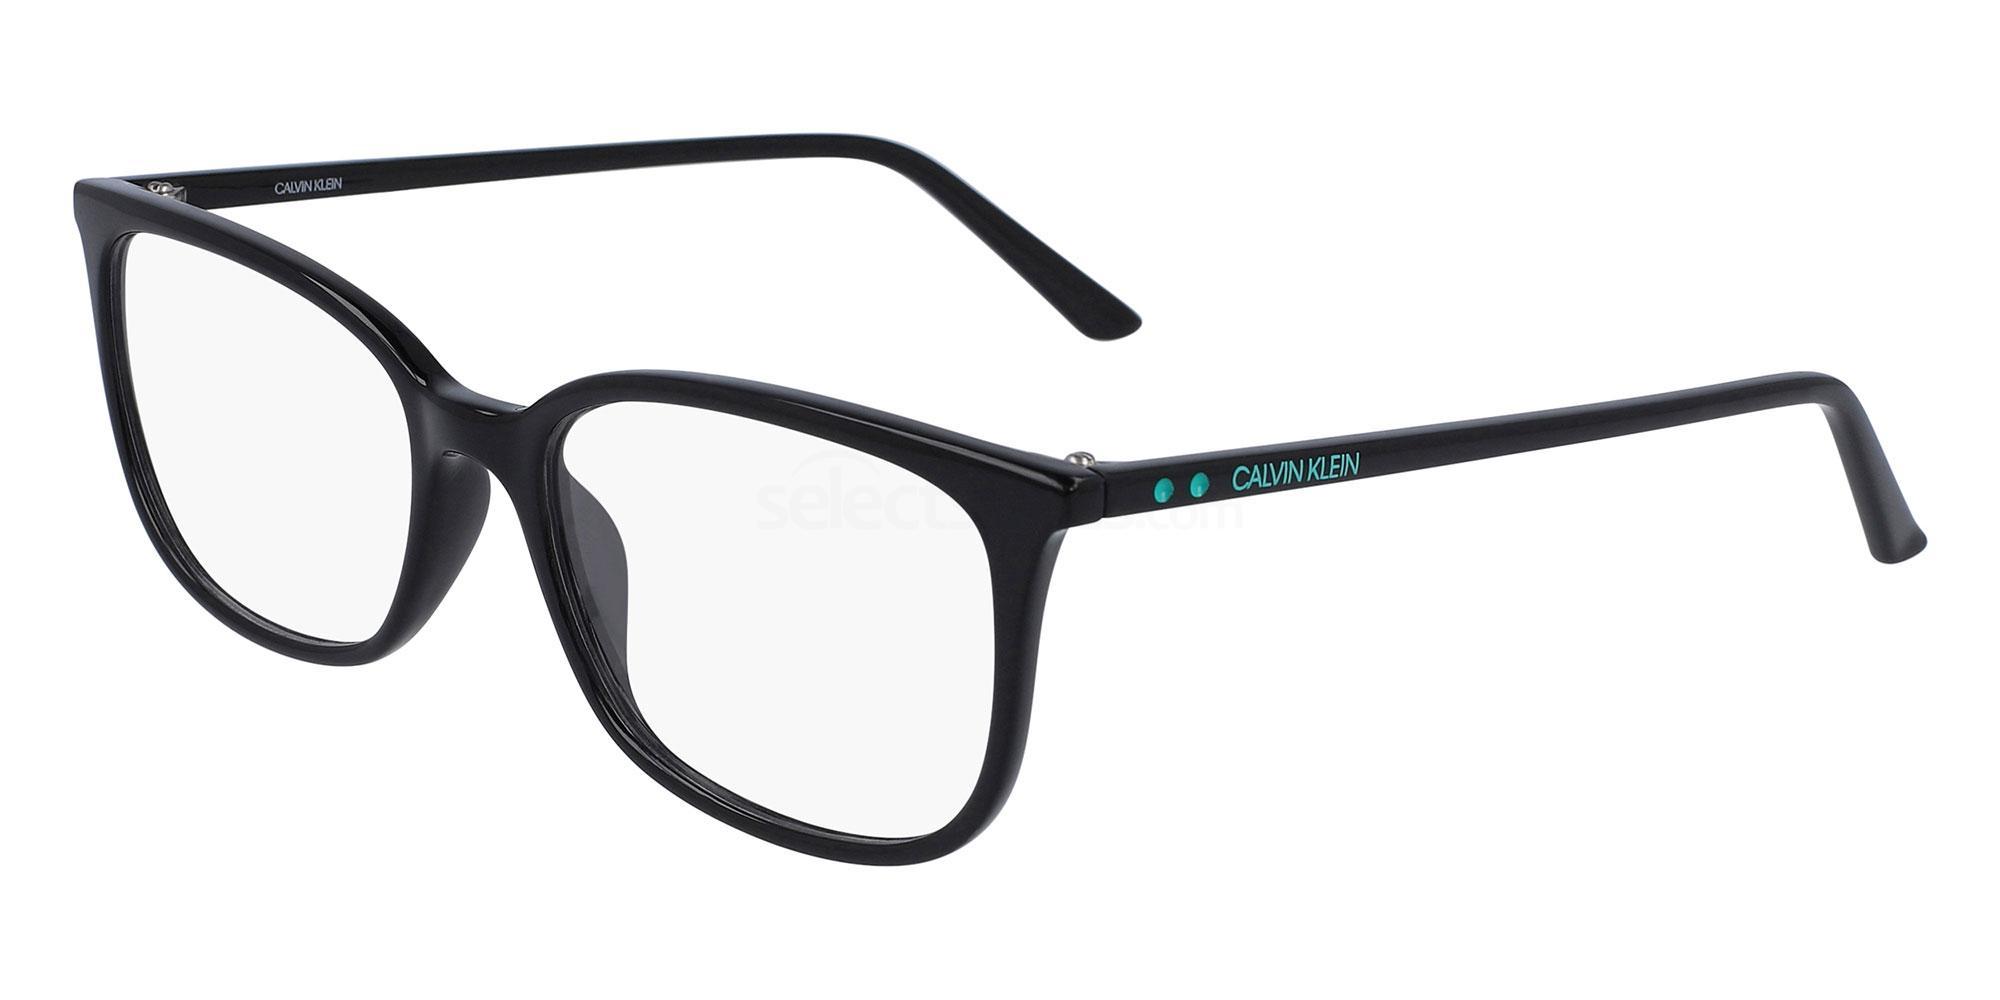 001 CK19515 Glasses, Calvin Klein